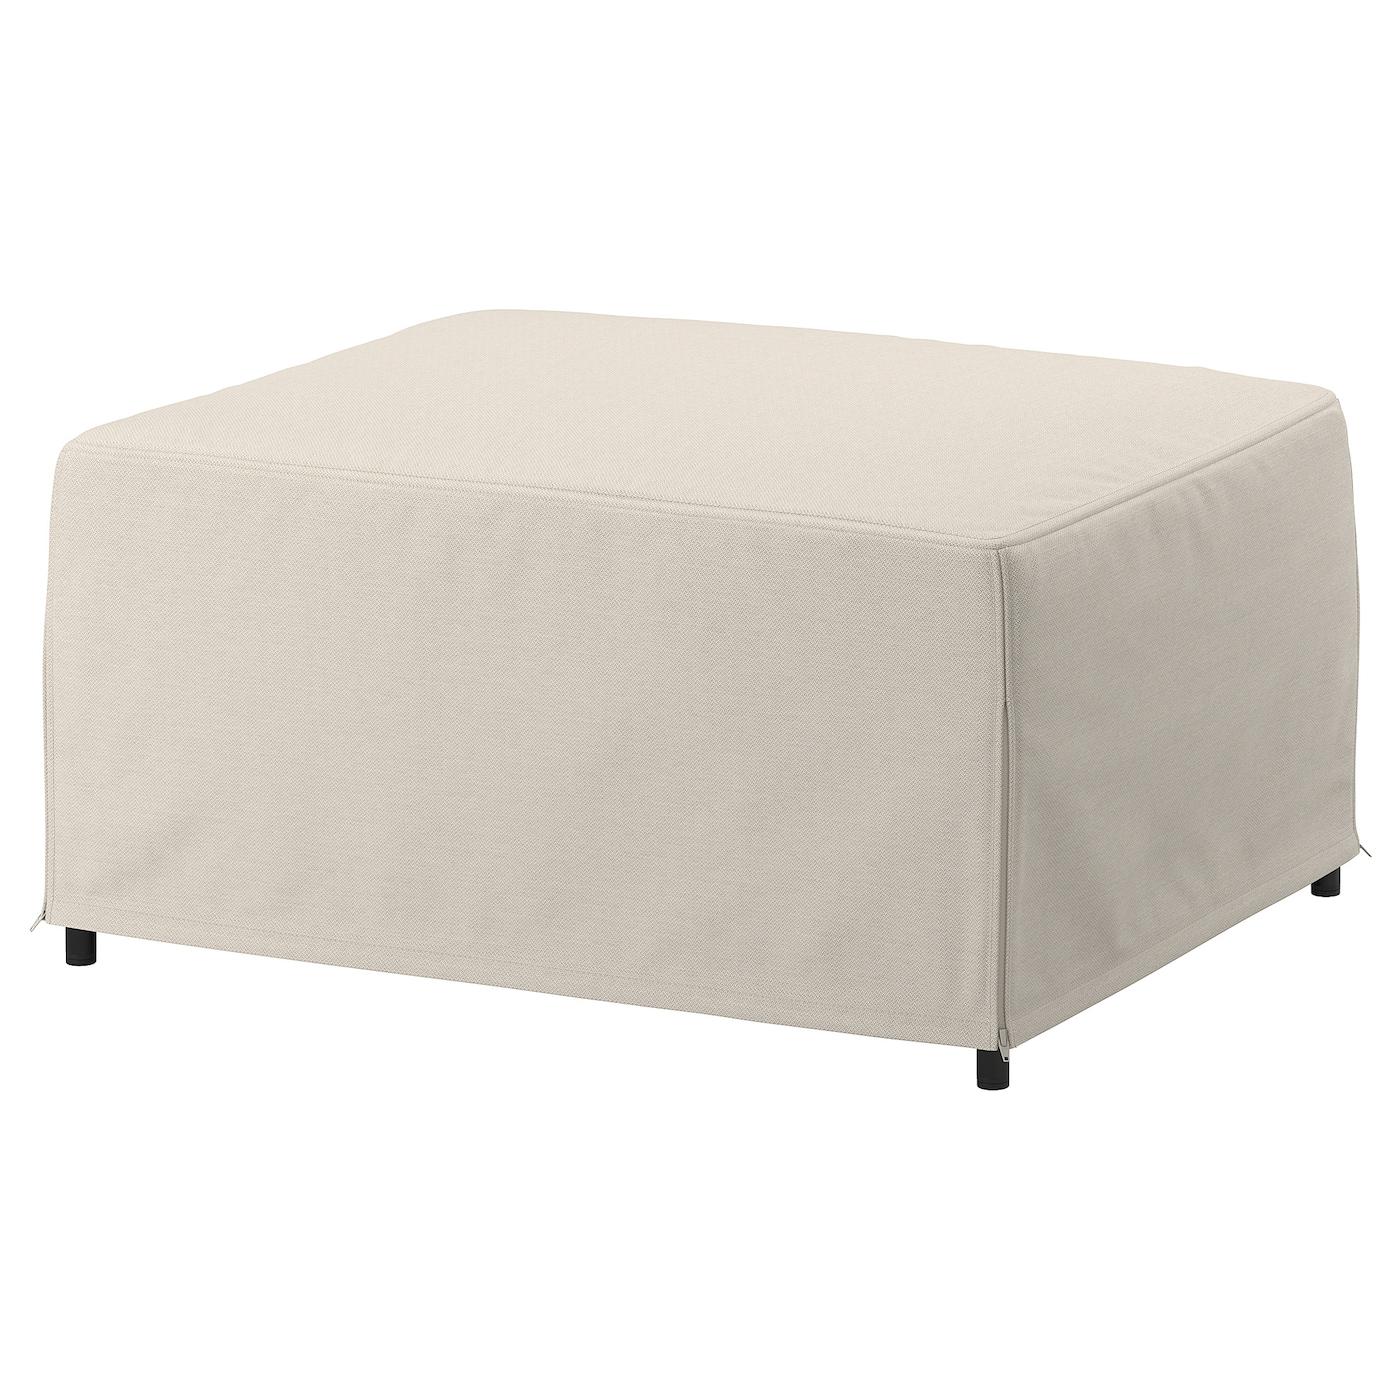 kungshamn housse repose pieds idekulla beige ikea. Black Bedroom Furniture Sets. Home Design Ideas